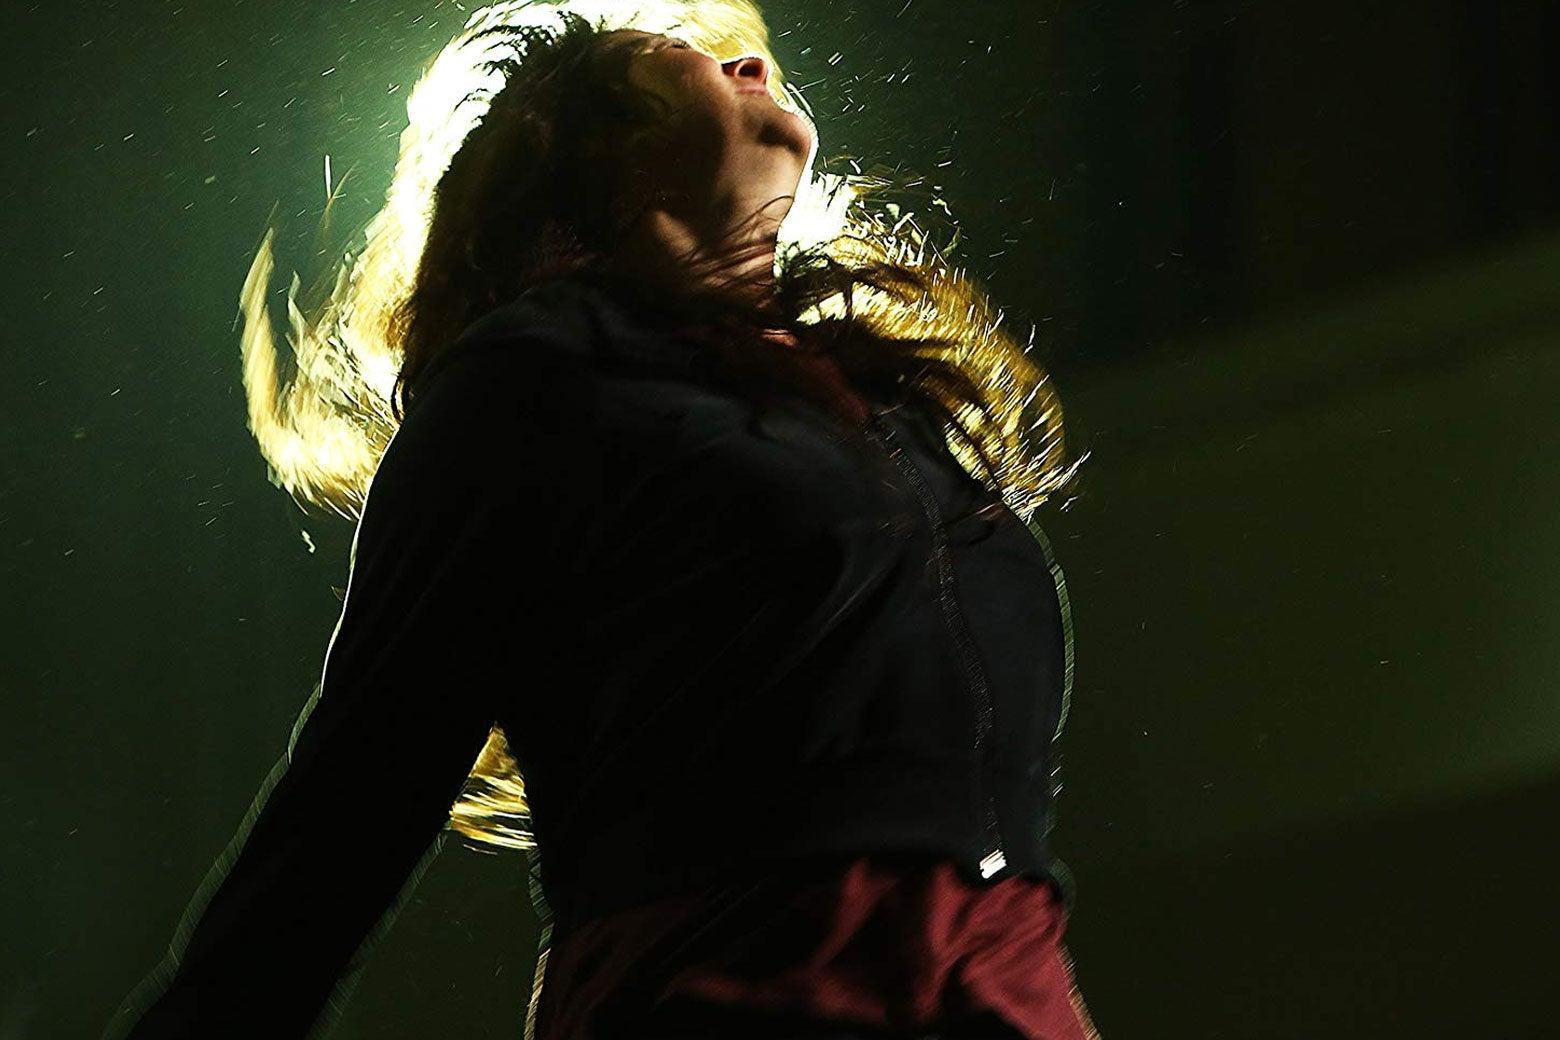 Trine Dyrholm dances onstage as Nico in Nico, 1988.